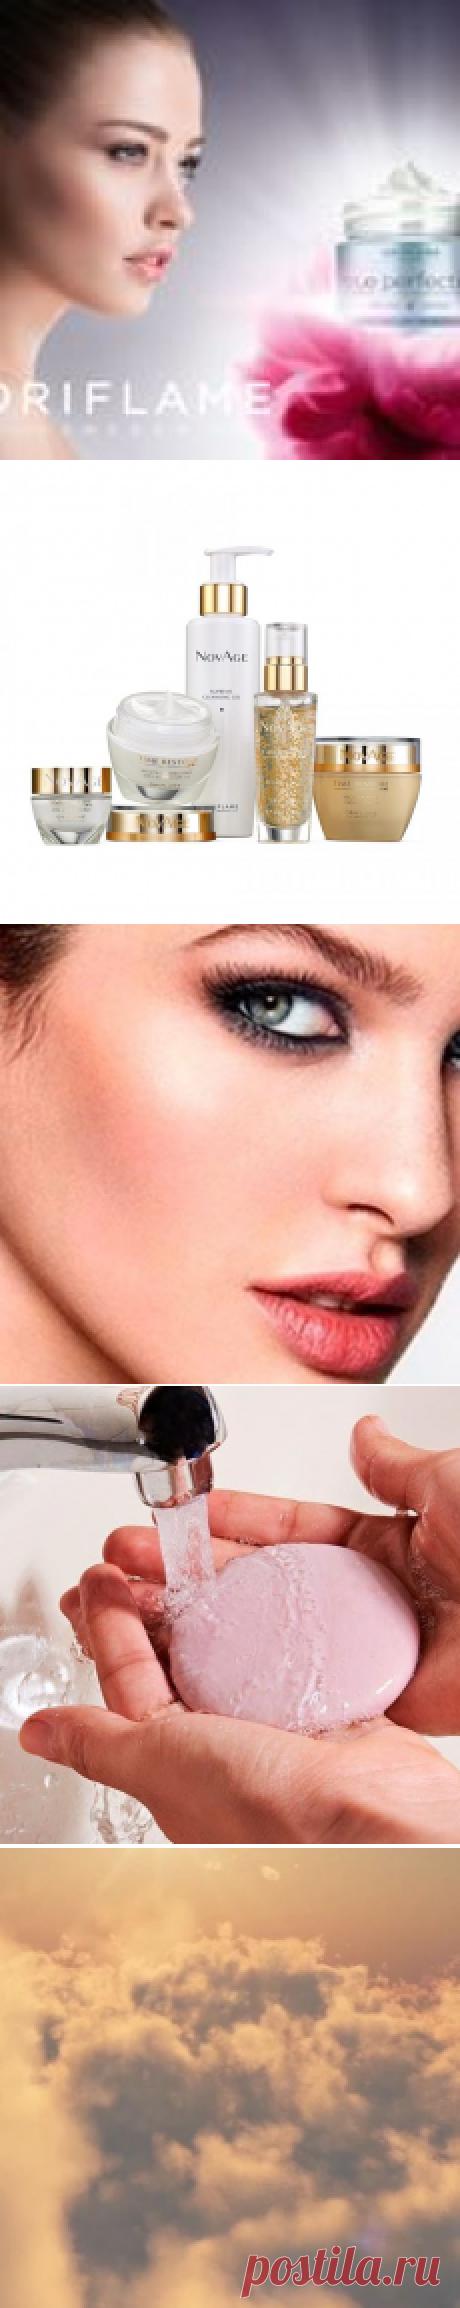 Стиль и красота (@style_and_beauty_oriflame) • Фото и видео в Instagram